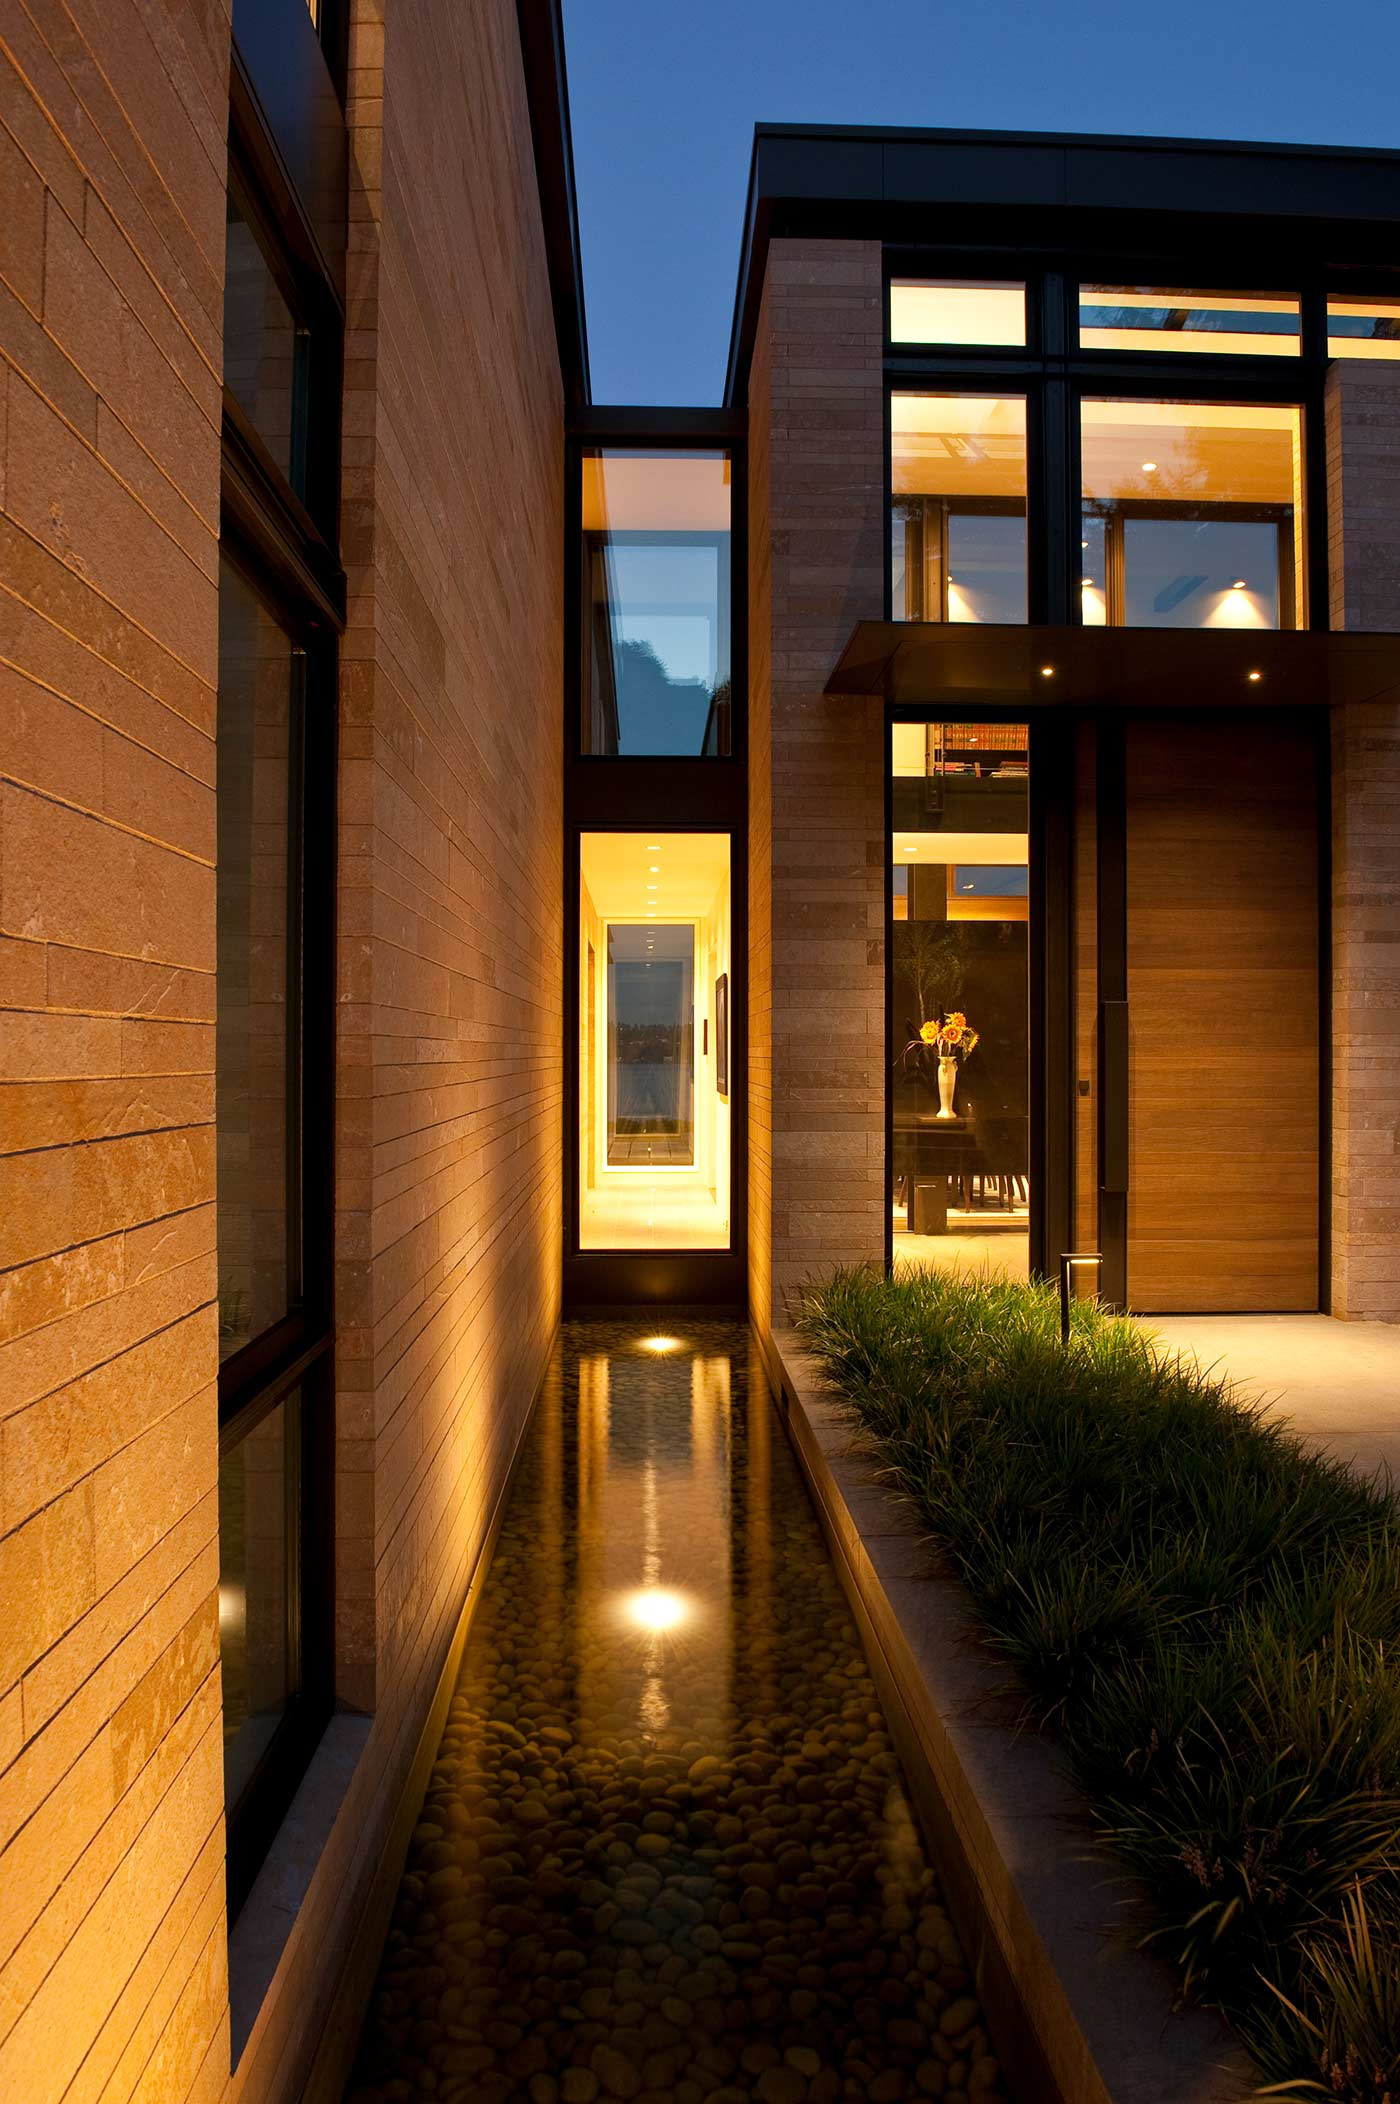 Washington Park Hilltop Residence - Exterior Entry